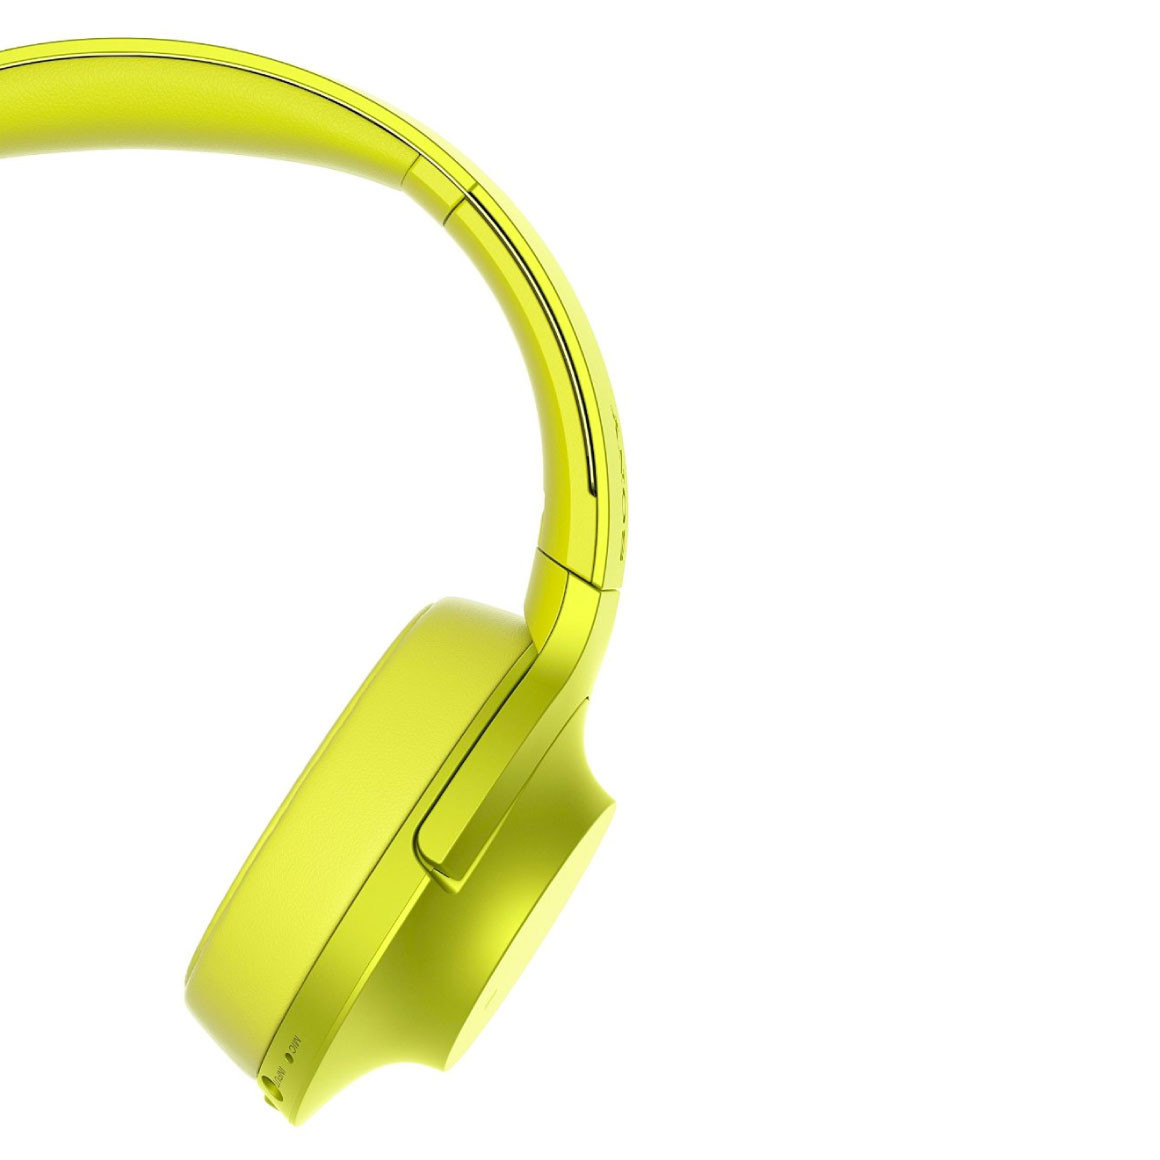 Sony MDR-100ABNY жёлтого цвета купить в Sony Centre Воронеж